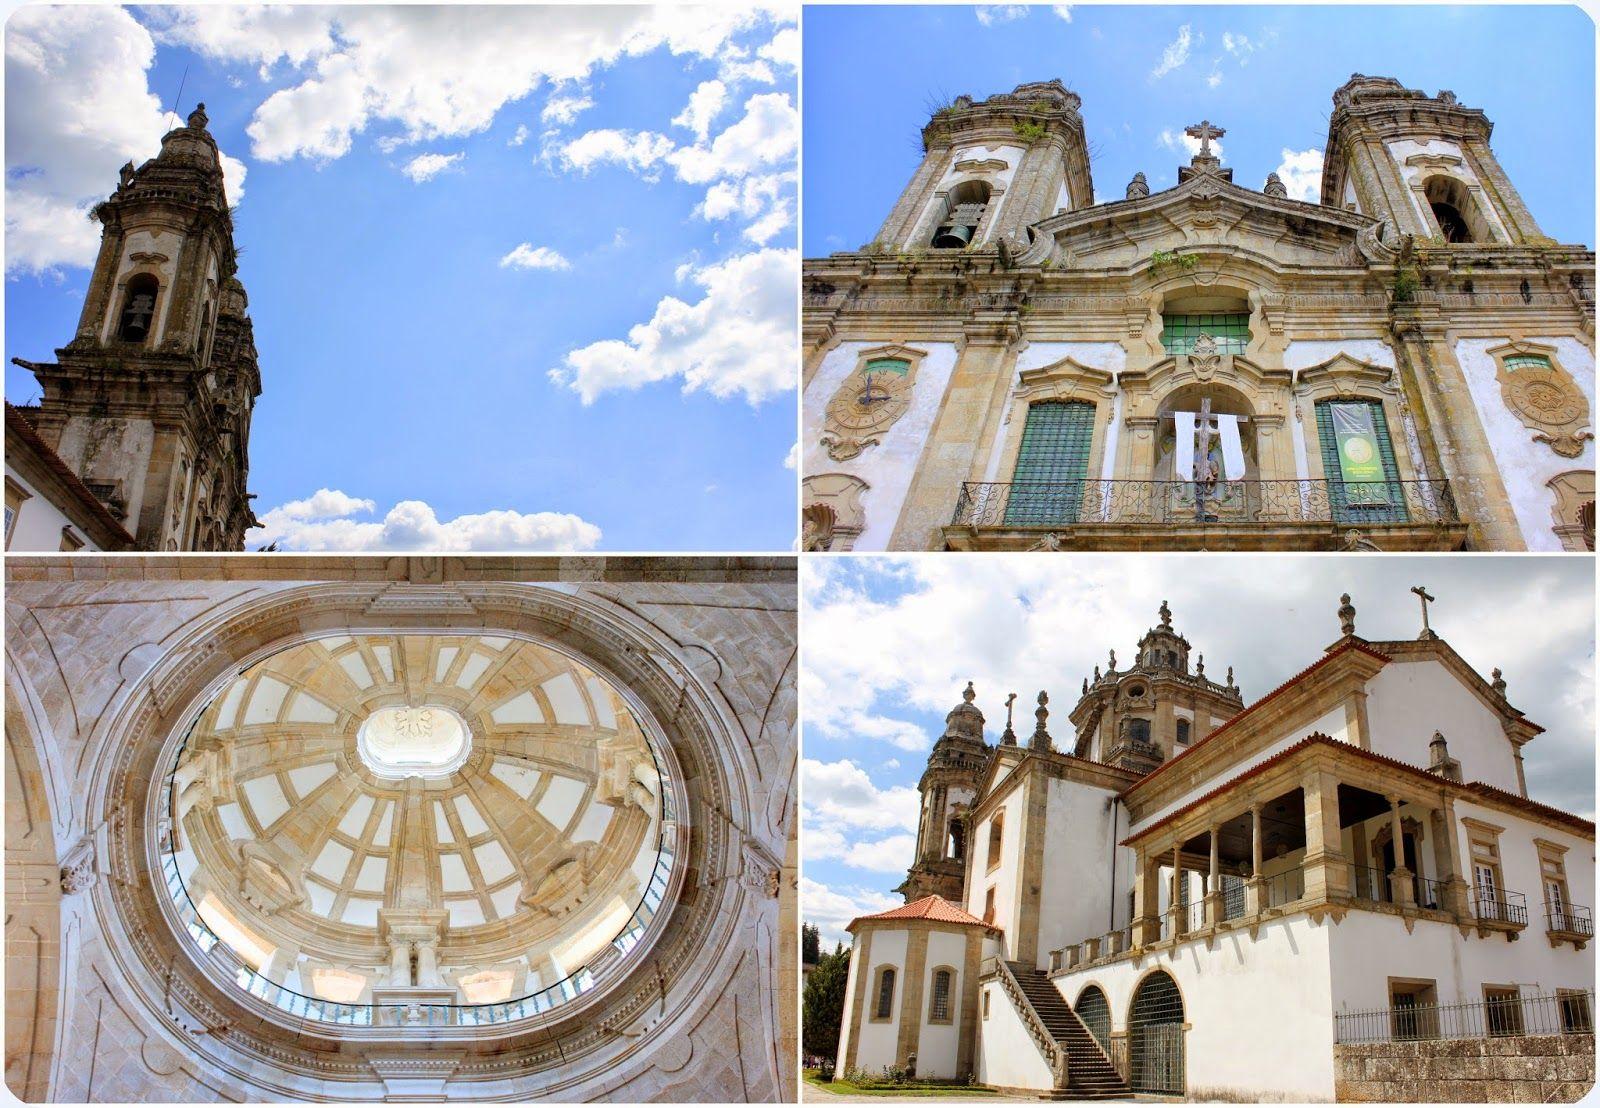 Mosteiro S. Miguel de Refojos, North Portugal http://thebohemianmemoir.blogspot.com #BohemianMemoir